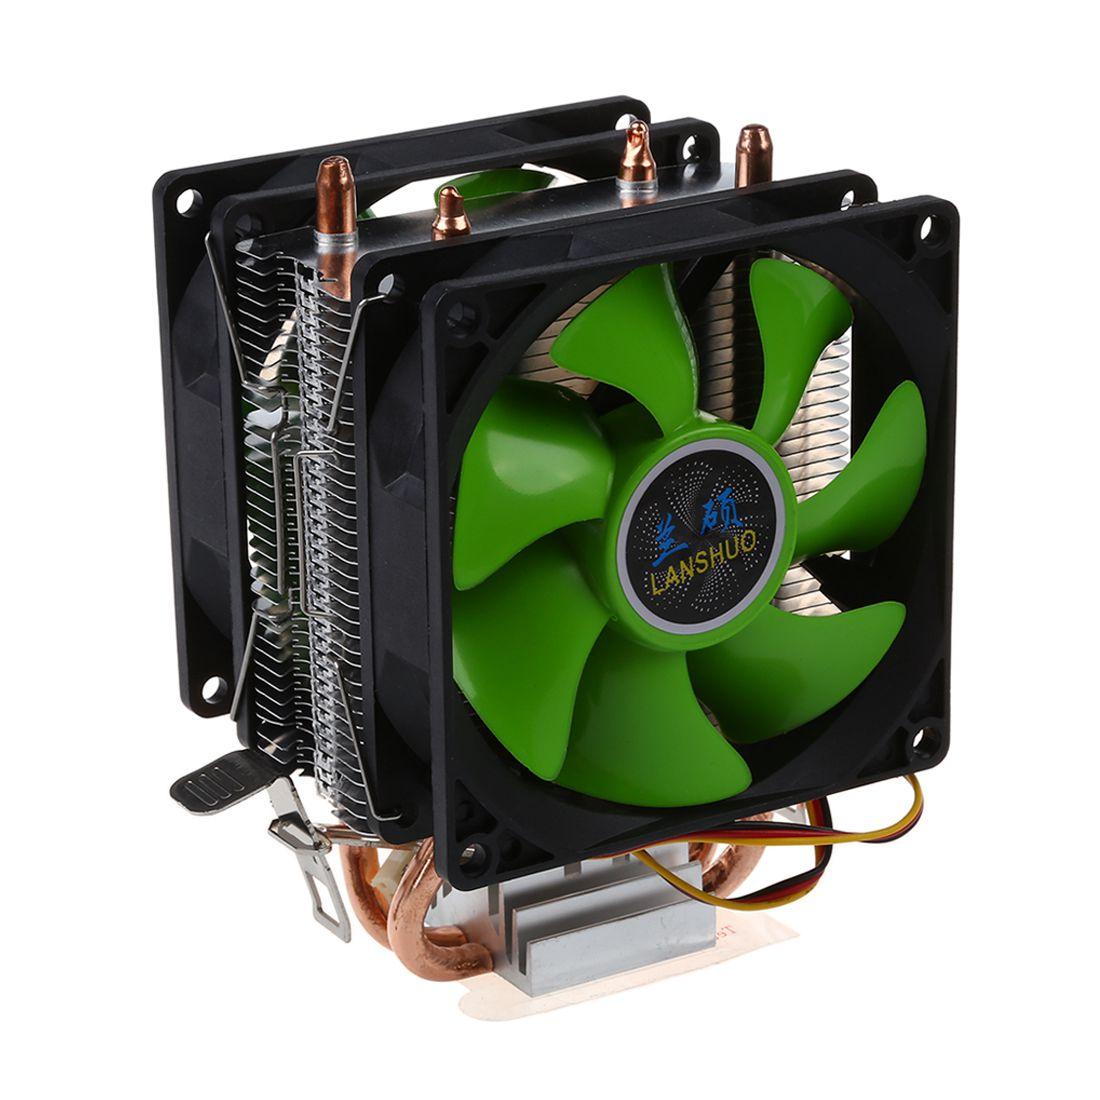 HOT-CPU kühler Silent Fan Für Intel LGA775/1156/1155 AMD AM2/AM2 +/AM3